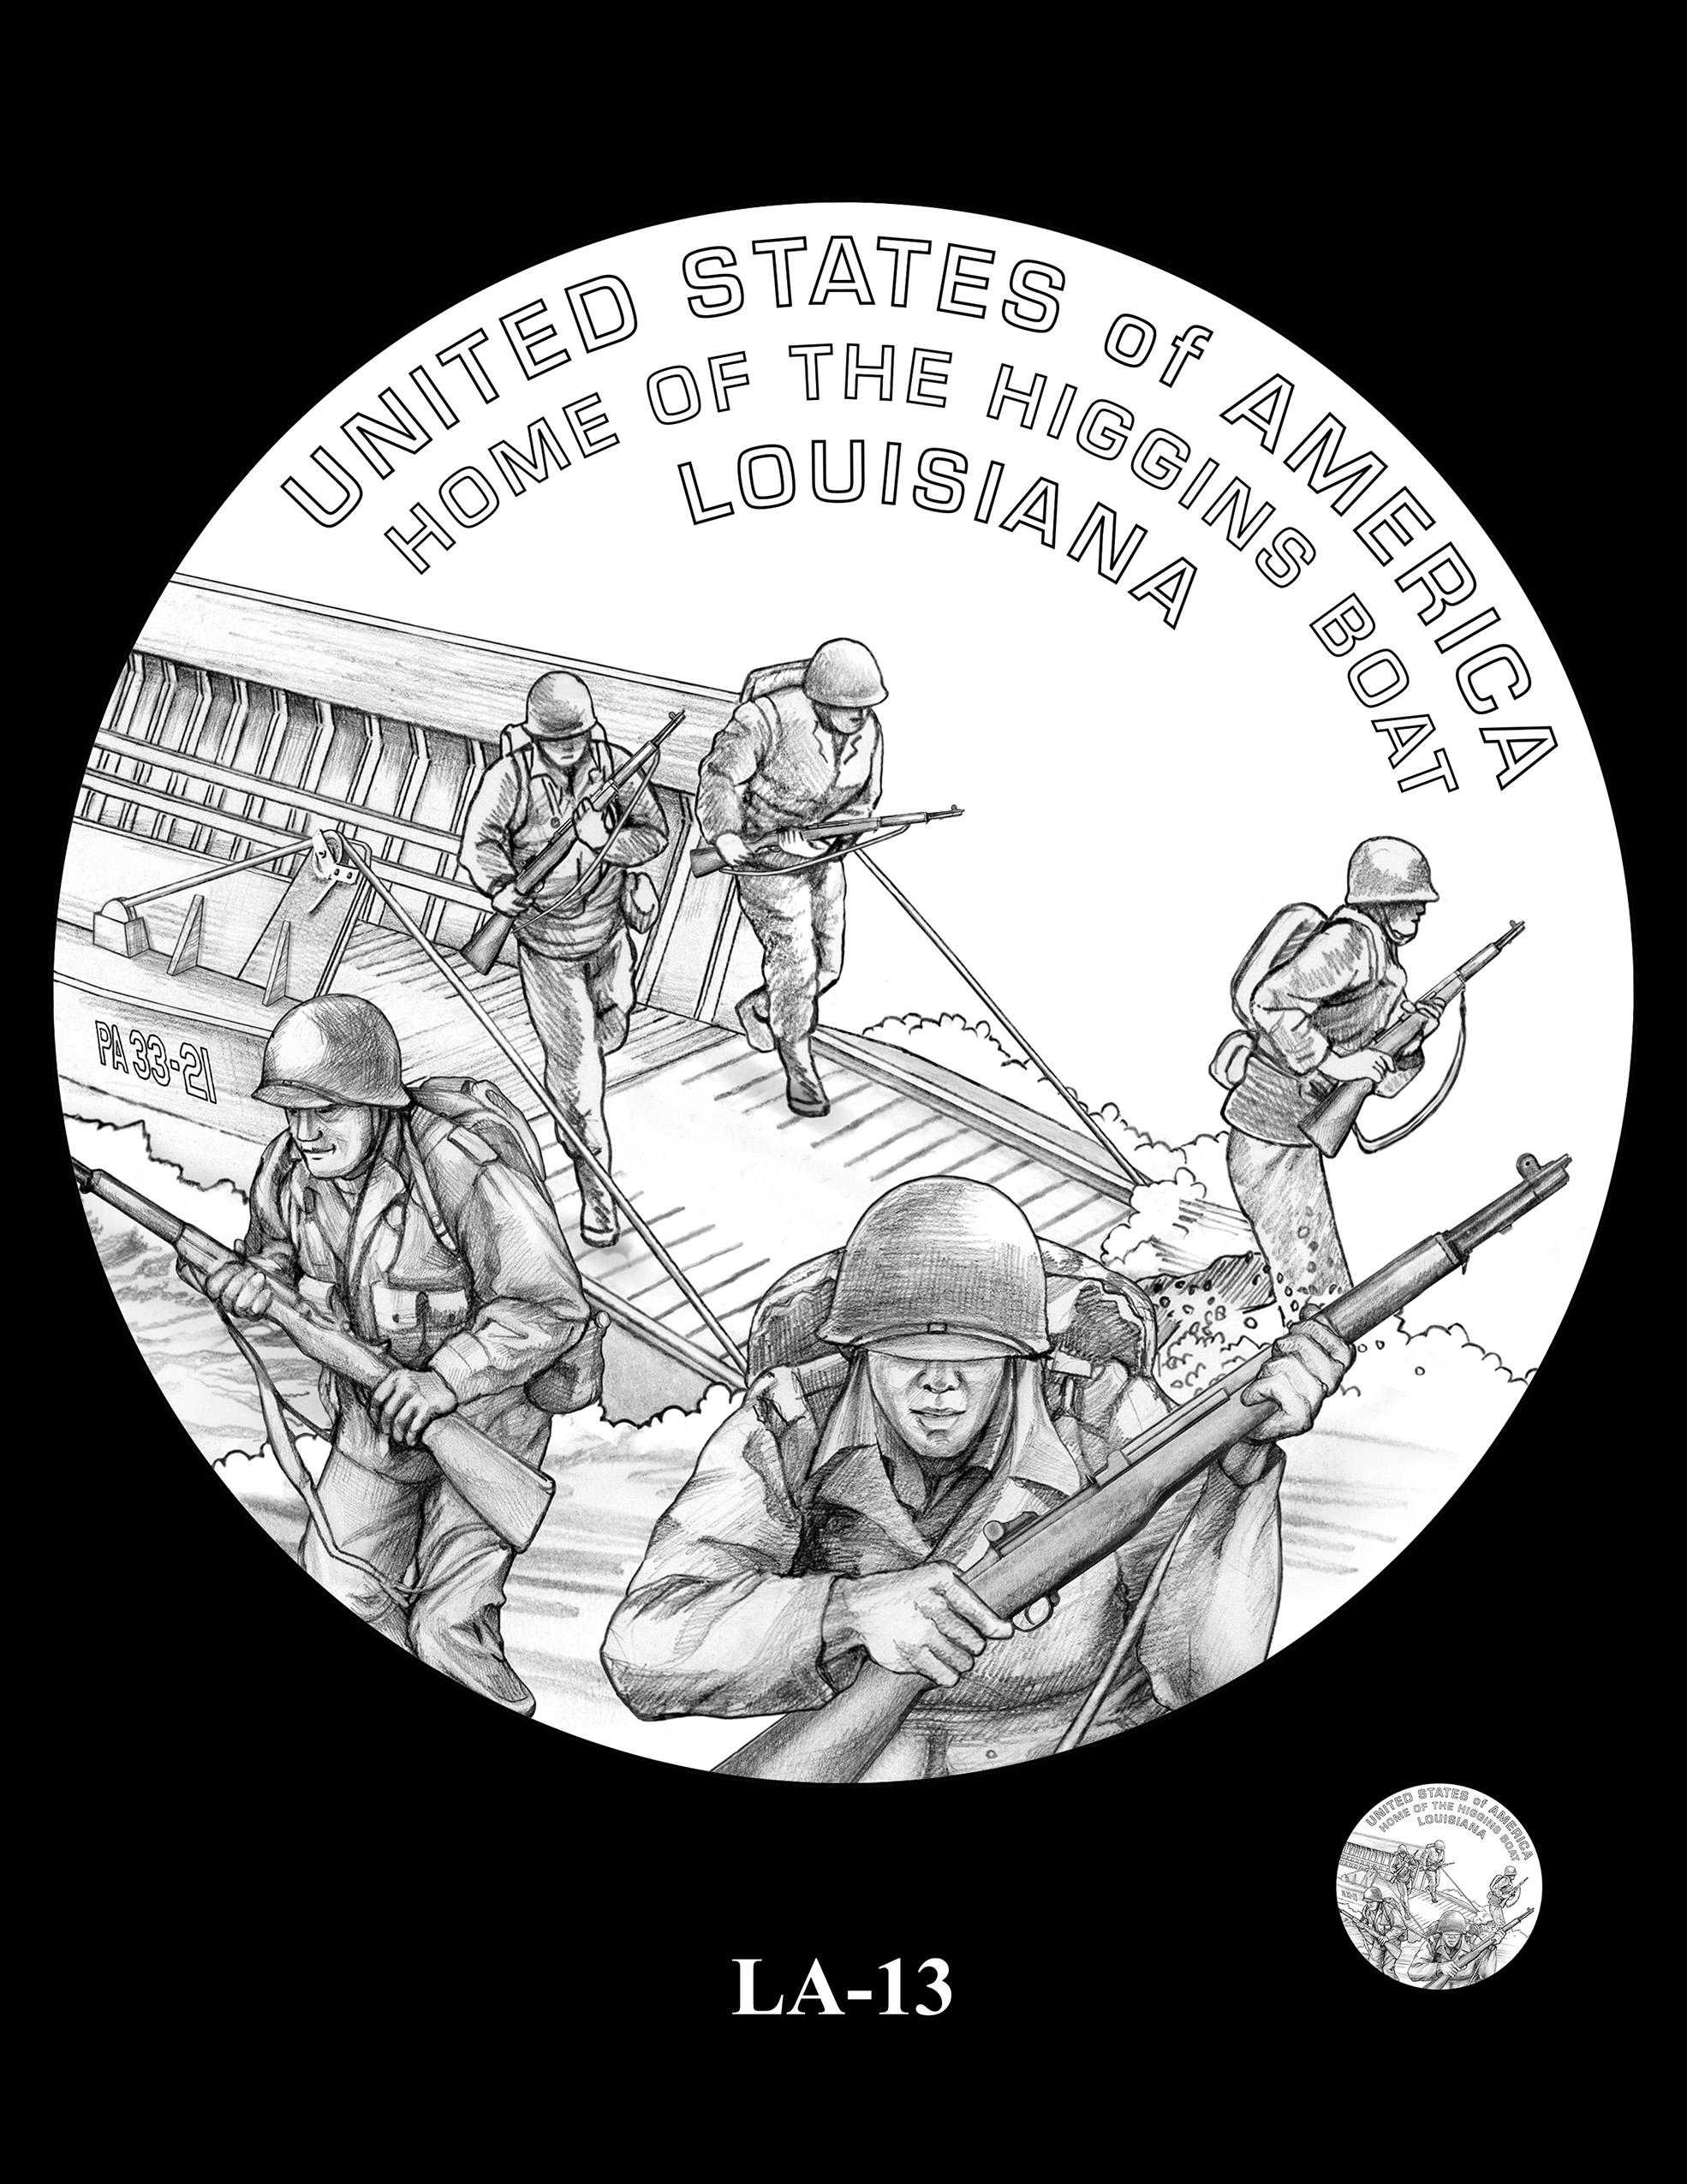 LA-13 -- 2023 American Innovation $1 Coin Program - Louisiana